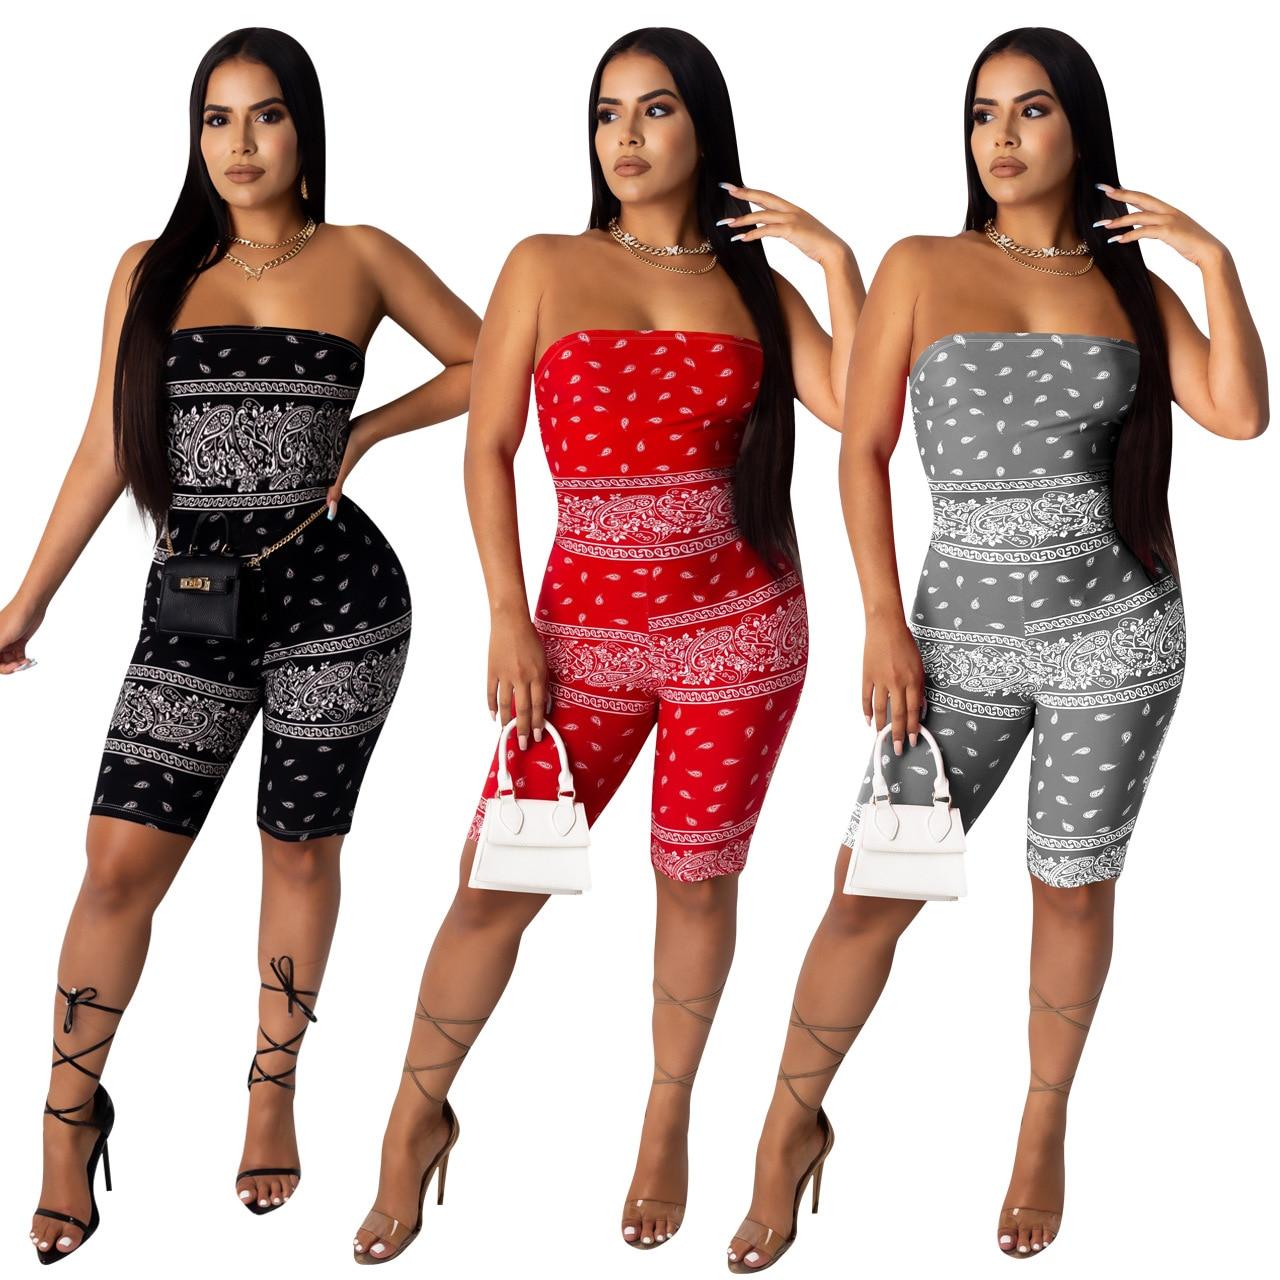 Jumpsuit Moda Feminina Summer Women Rompers Body Romper Fashion Playsuit Ropa Sexy Mono Corto Mujer